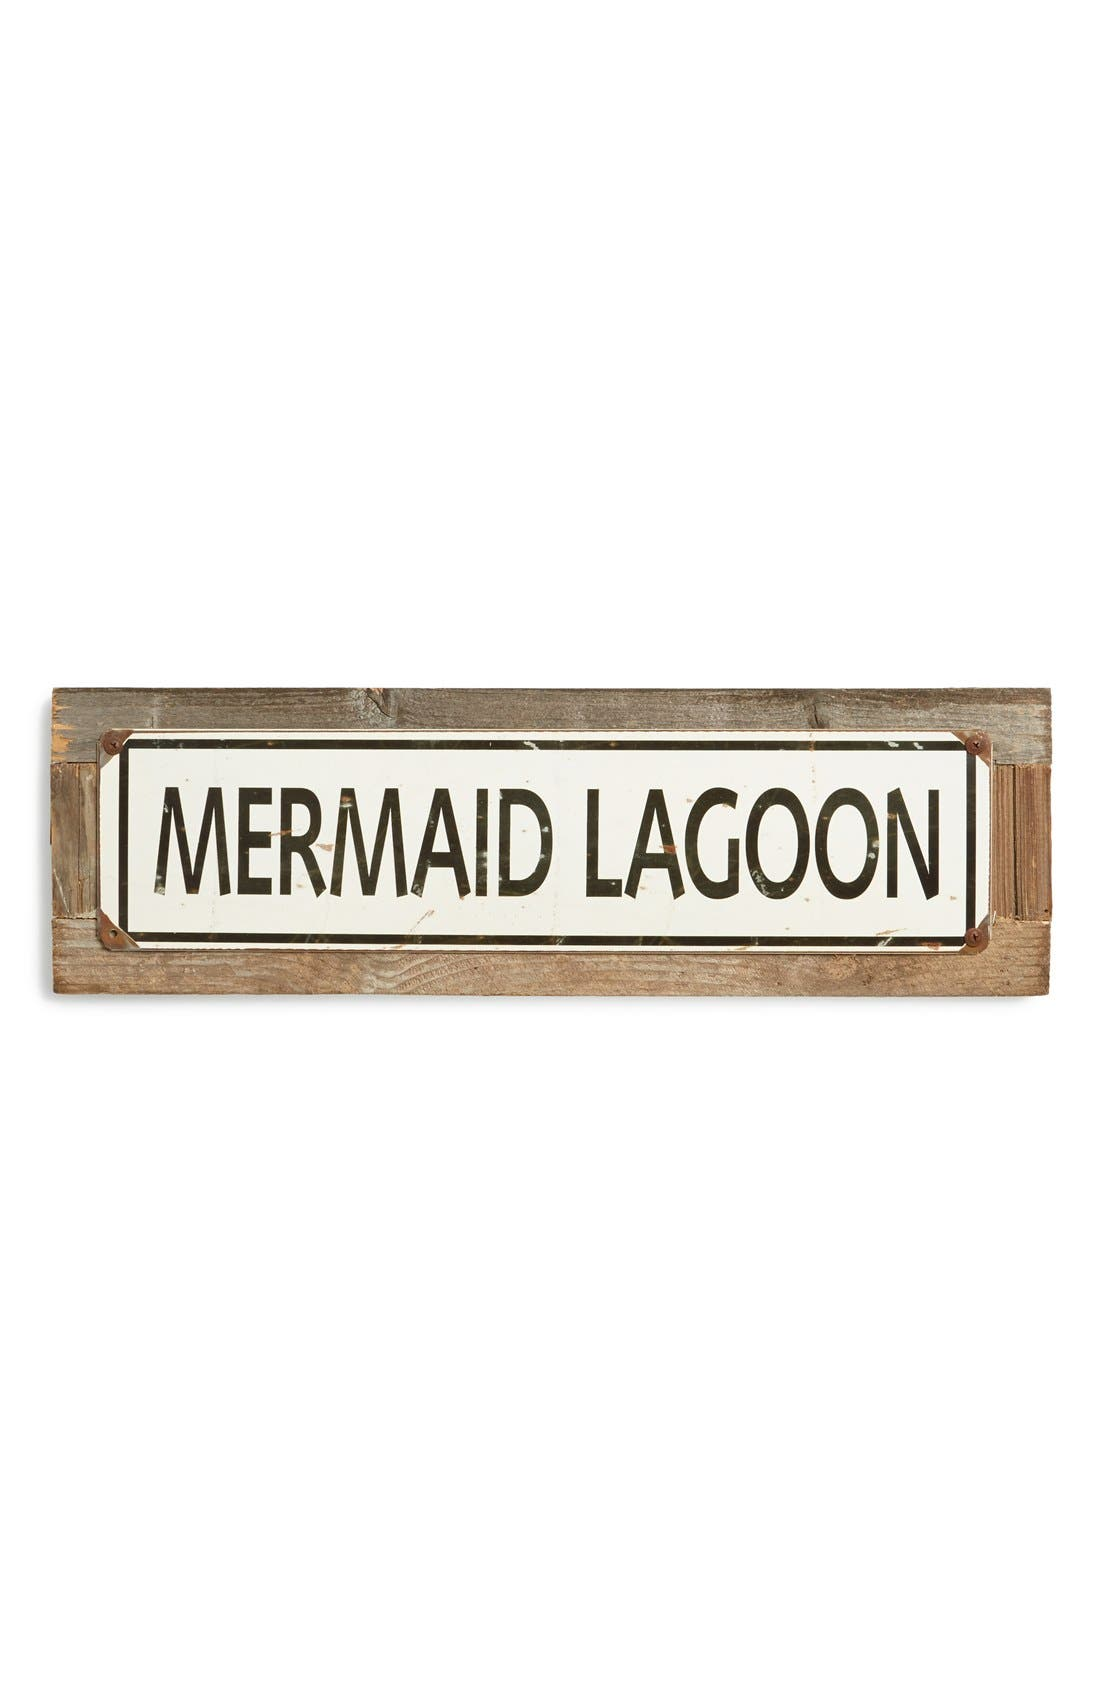 Alternate Image 1 Selected - Poncho & Goldstein 'Mermaid Lagoon' Sign